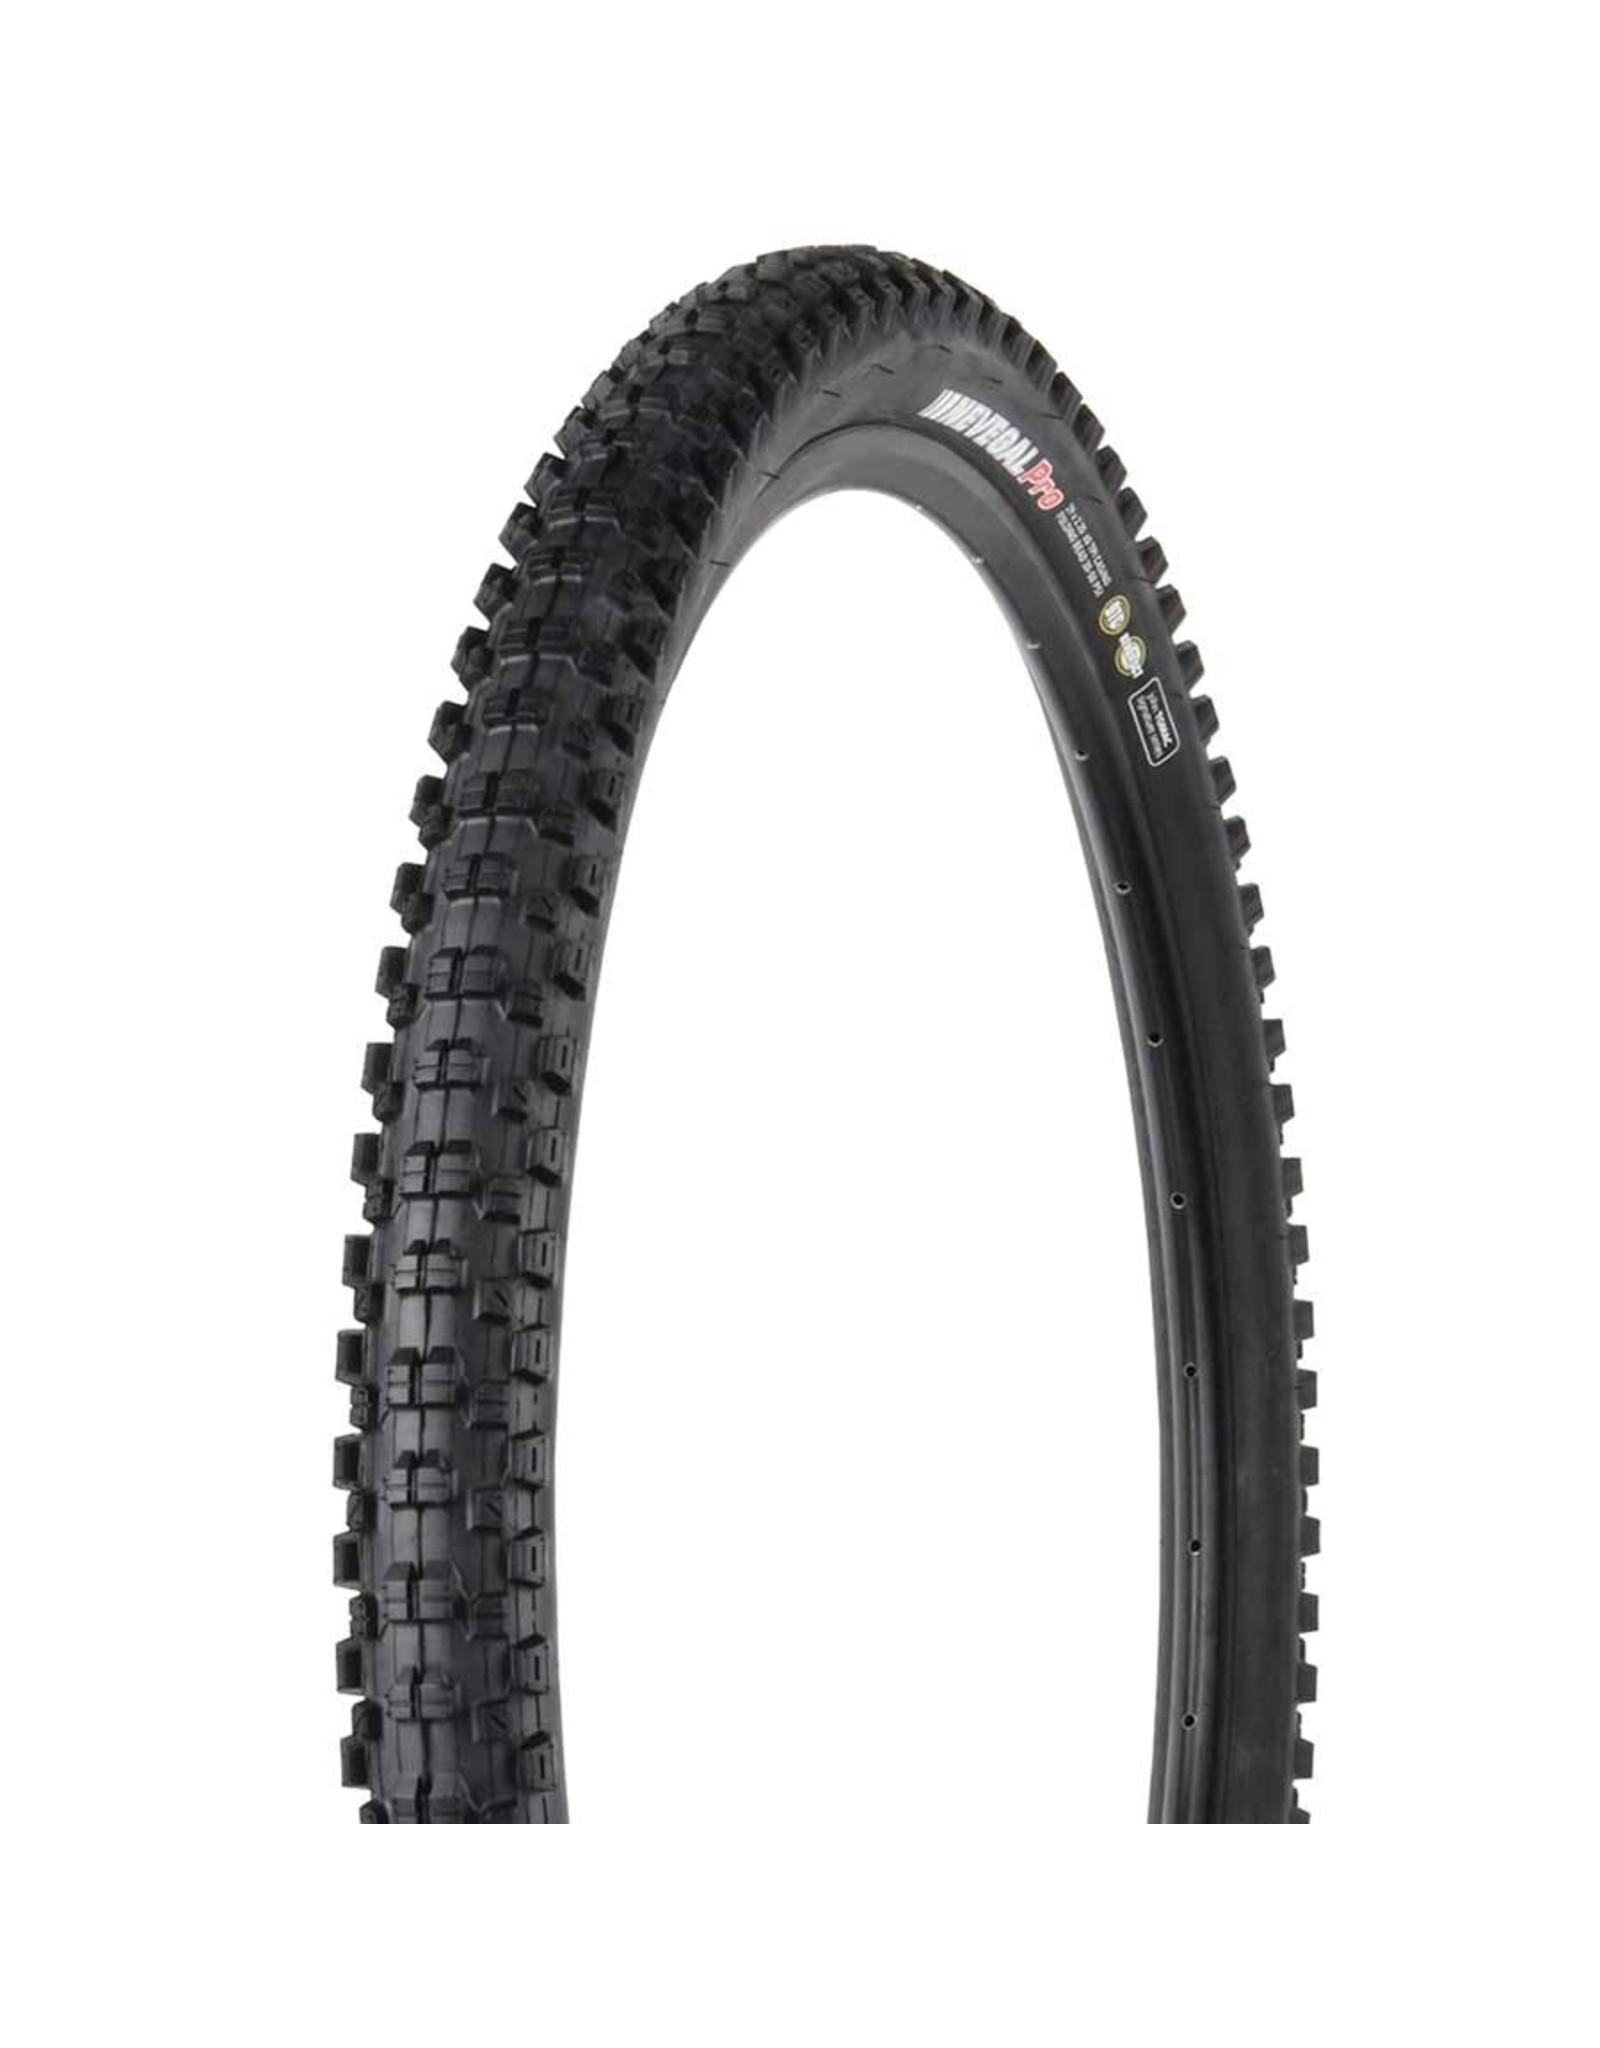 Kenda, Nevegal, Tire, 26''x2.10, Wire, Clincher, DTC, 60TPI, Black